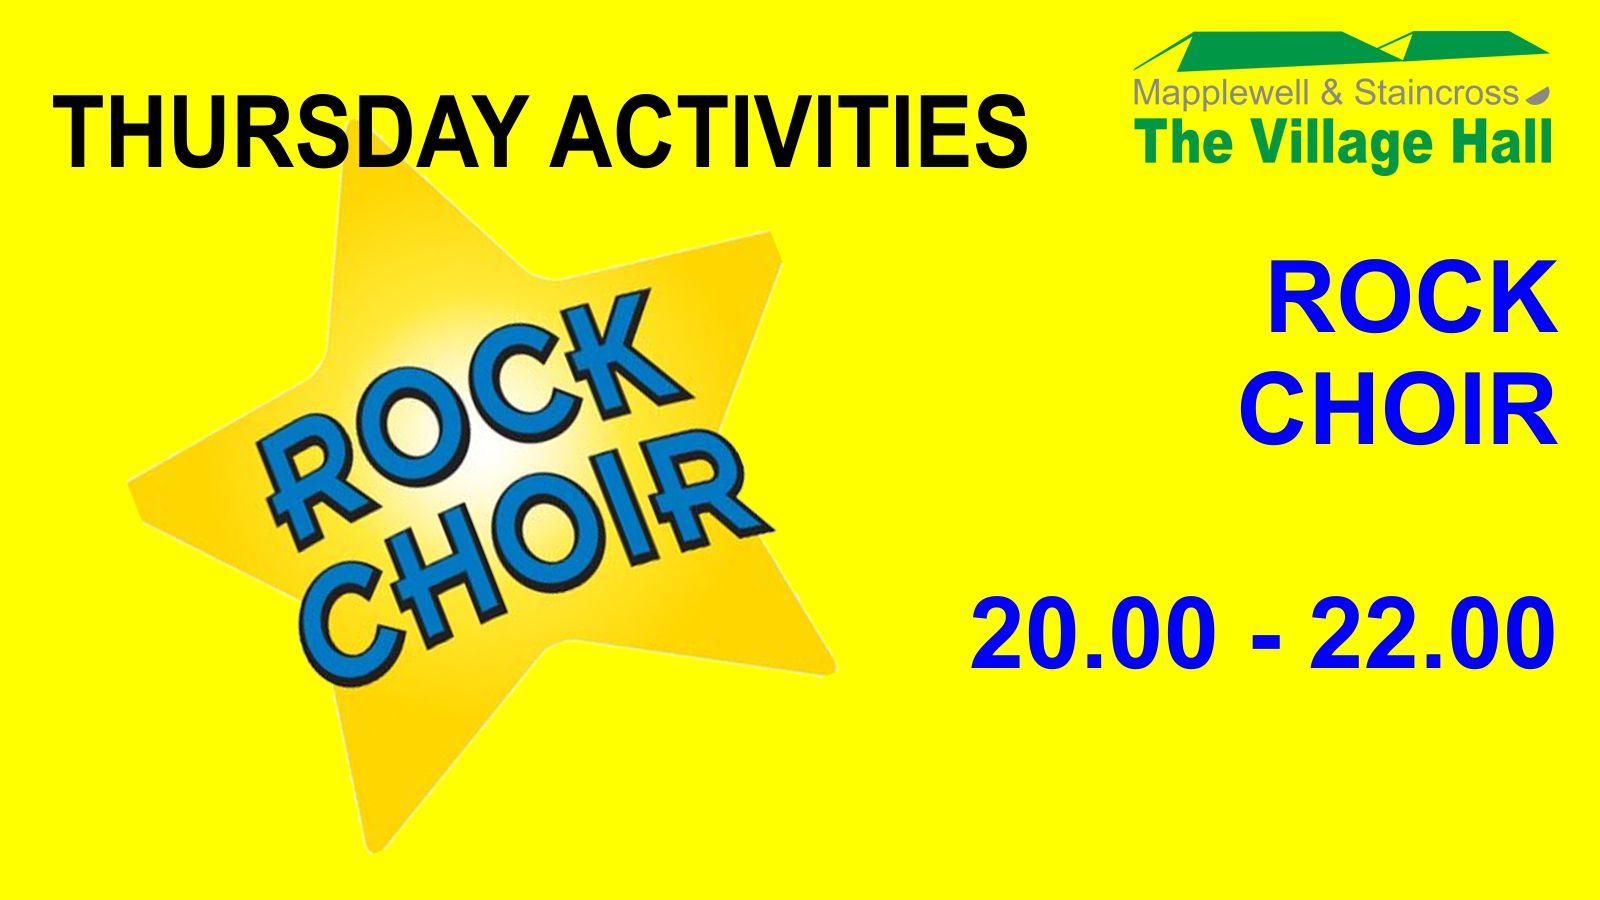 (C) Nick Hibberd Rock Choir